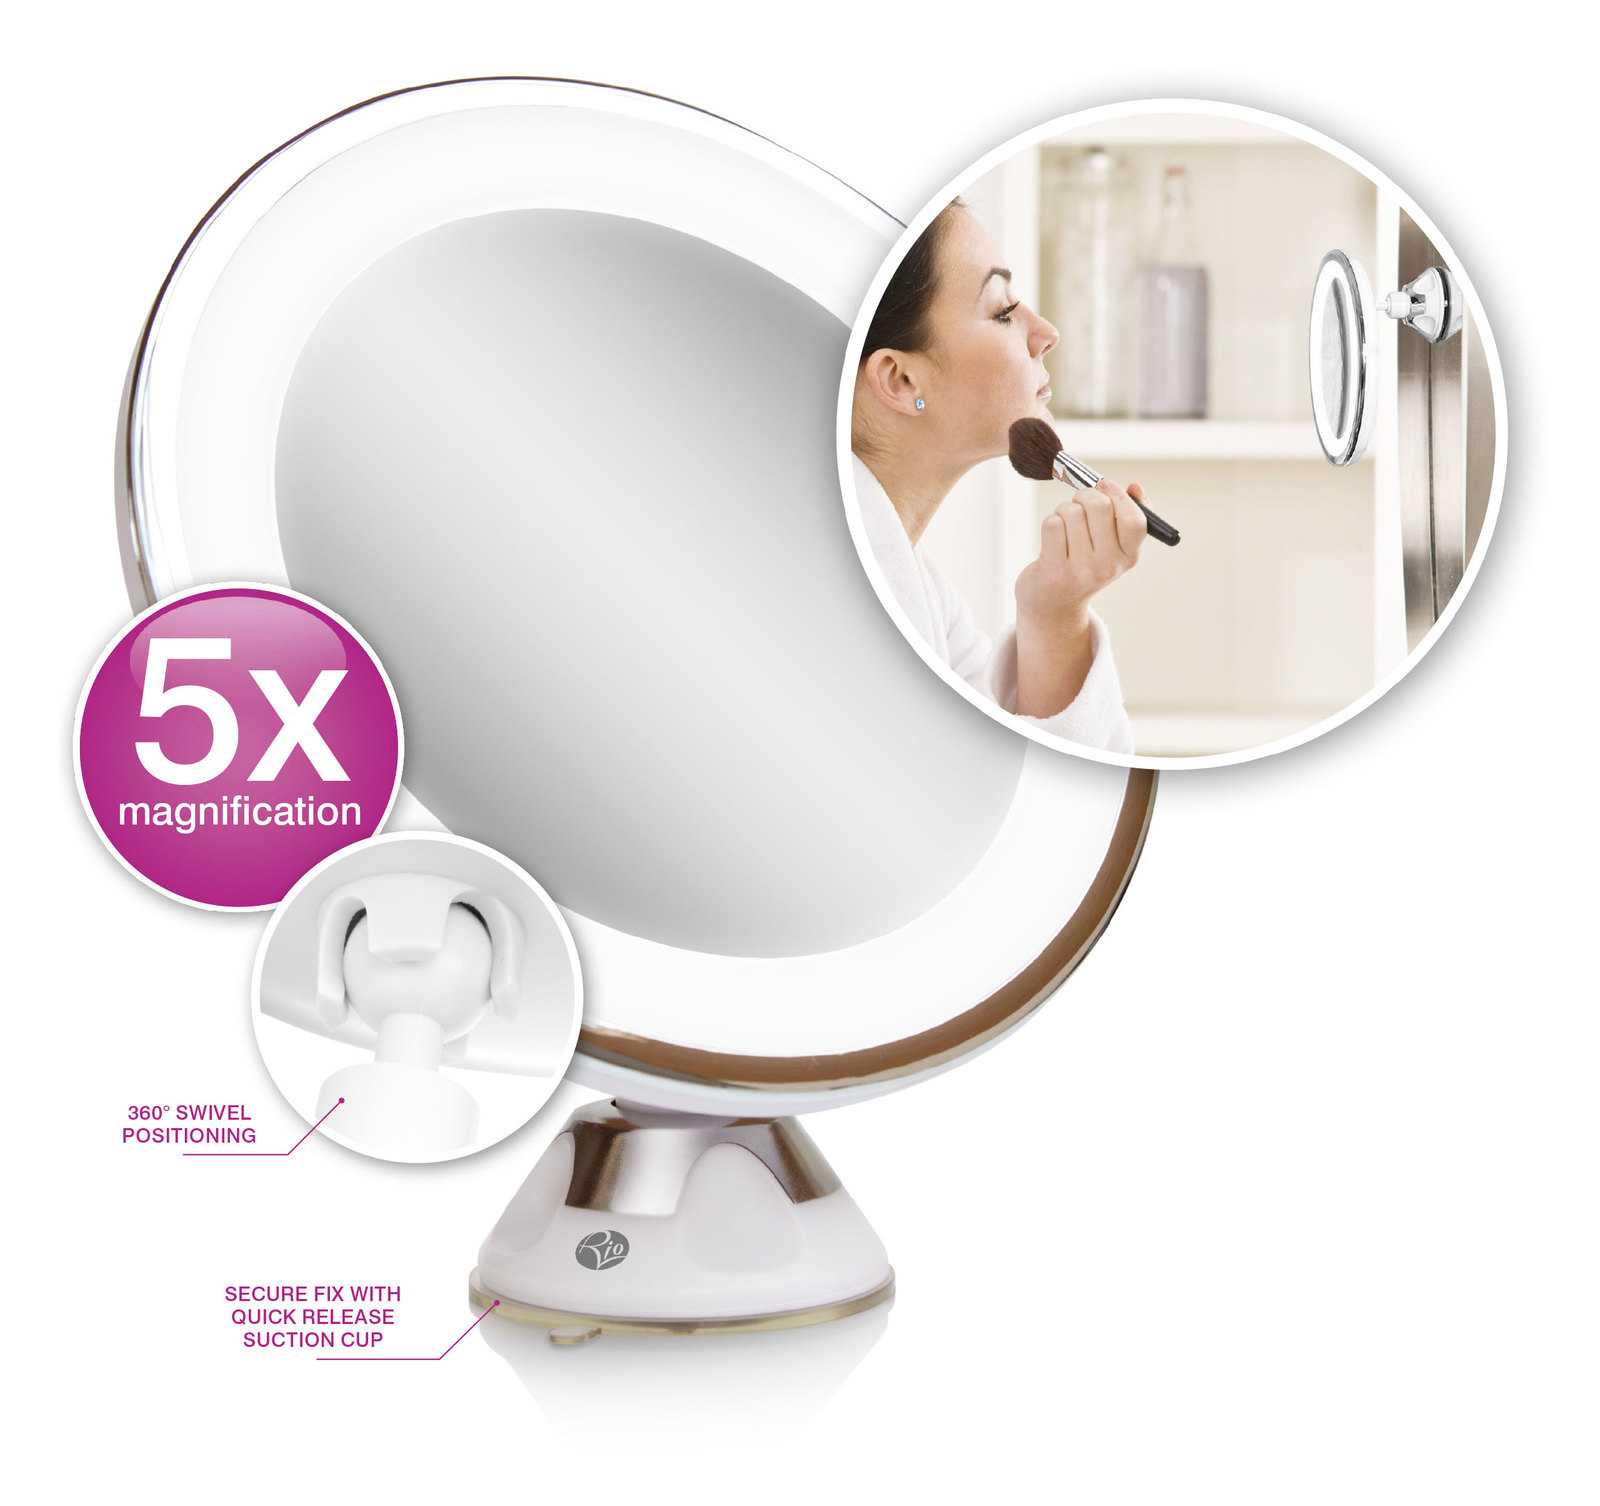 Multi Use LED Illuminated Makeup Mirror image